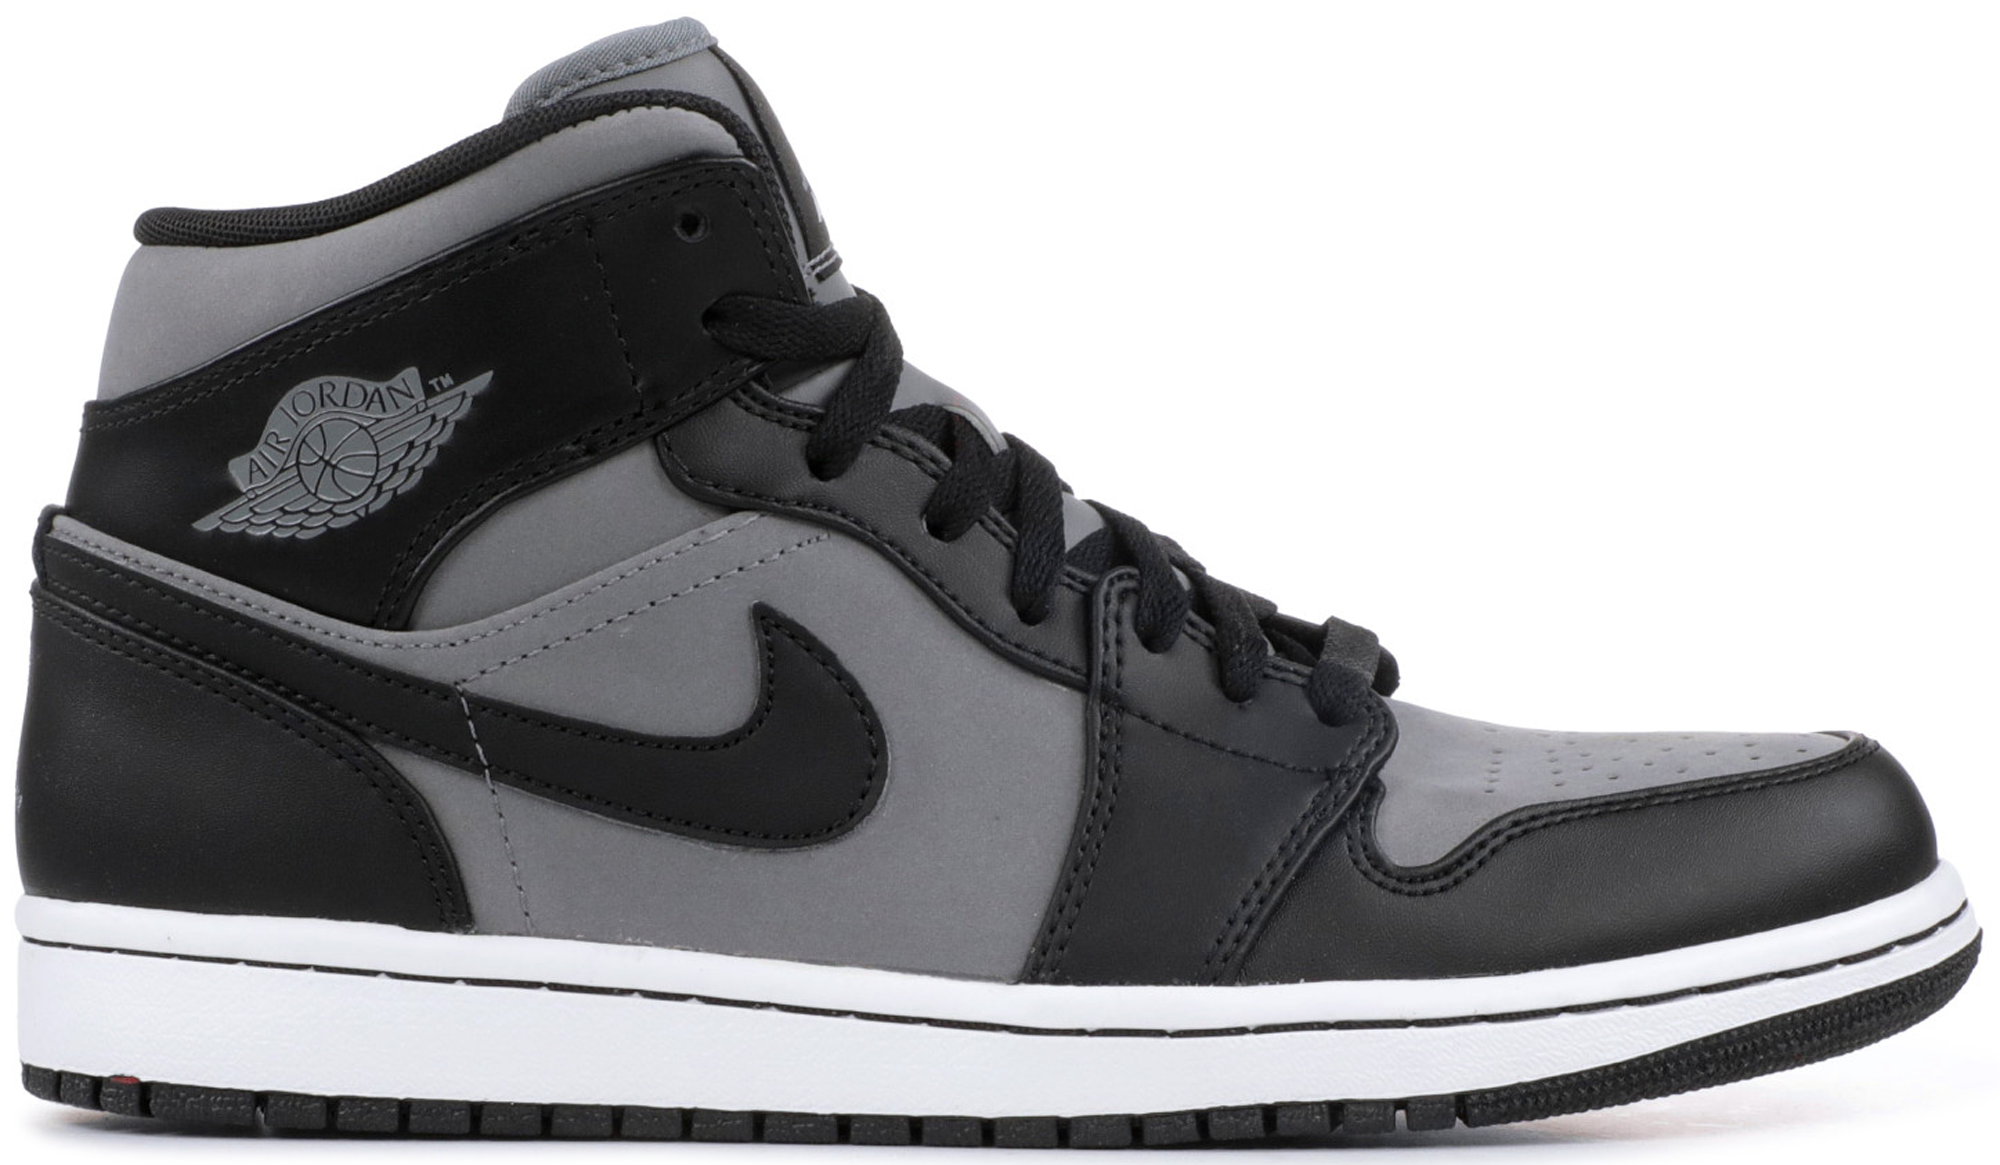 Jordan 1 Mid Cool Grey Black - 364770-023